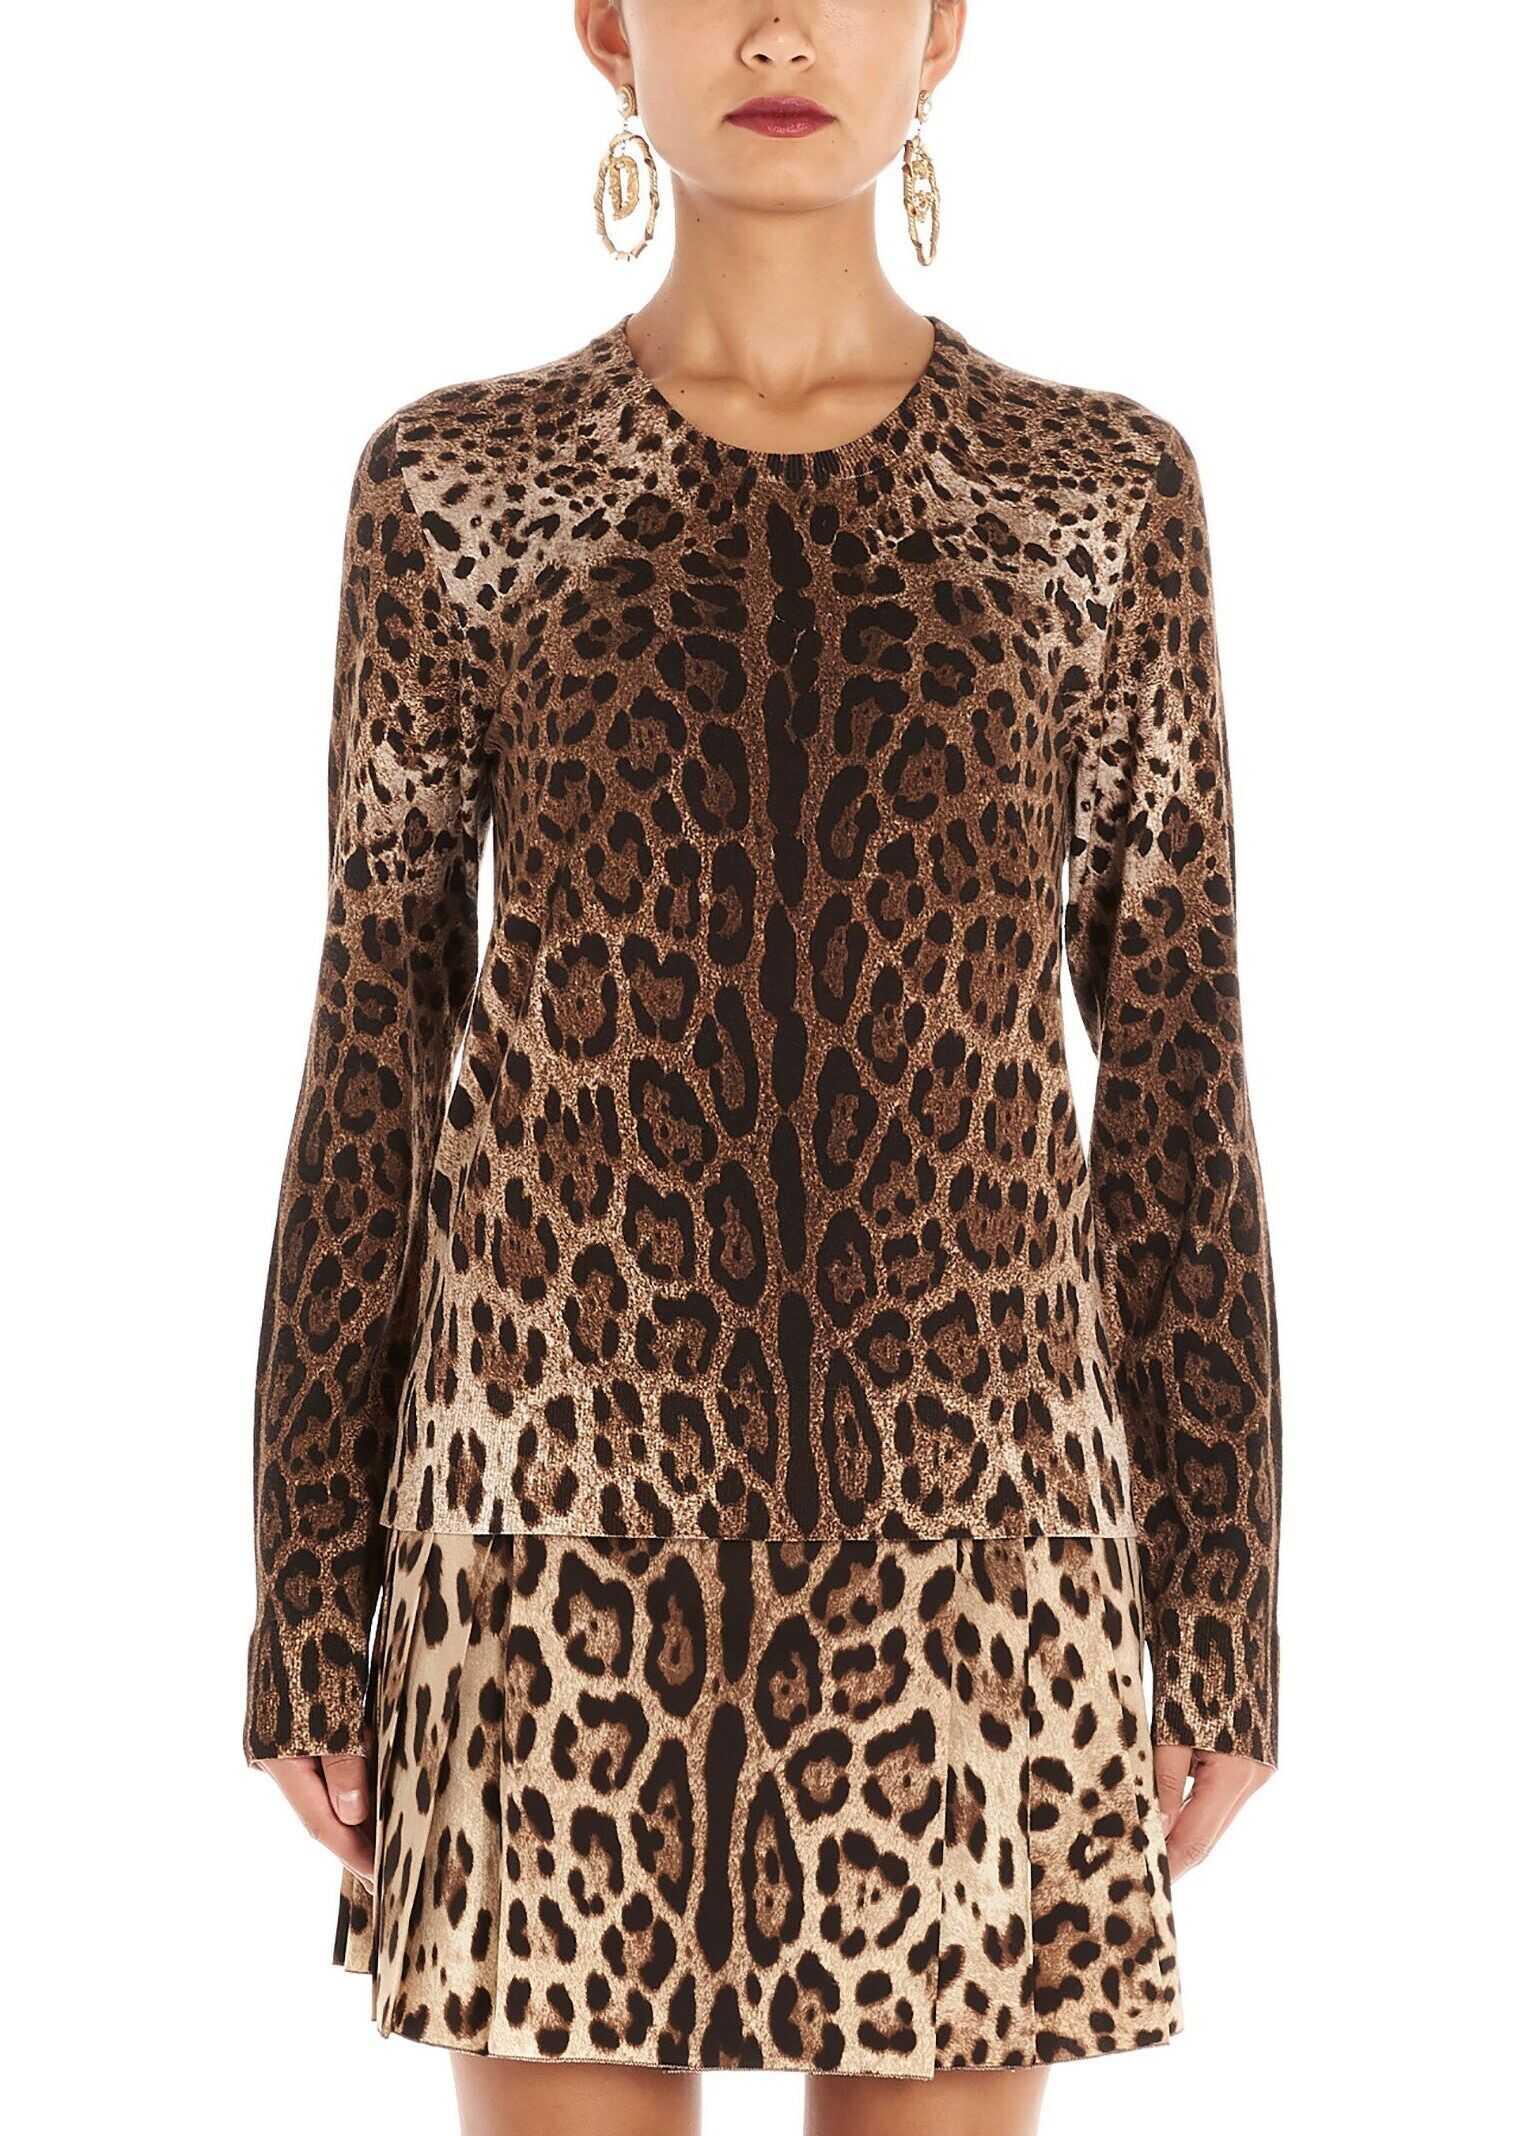 Dolce & Gabbana Wool Sweater BROWN